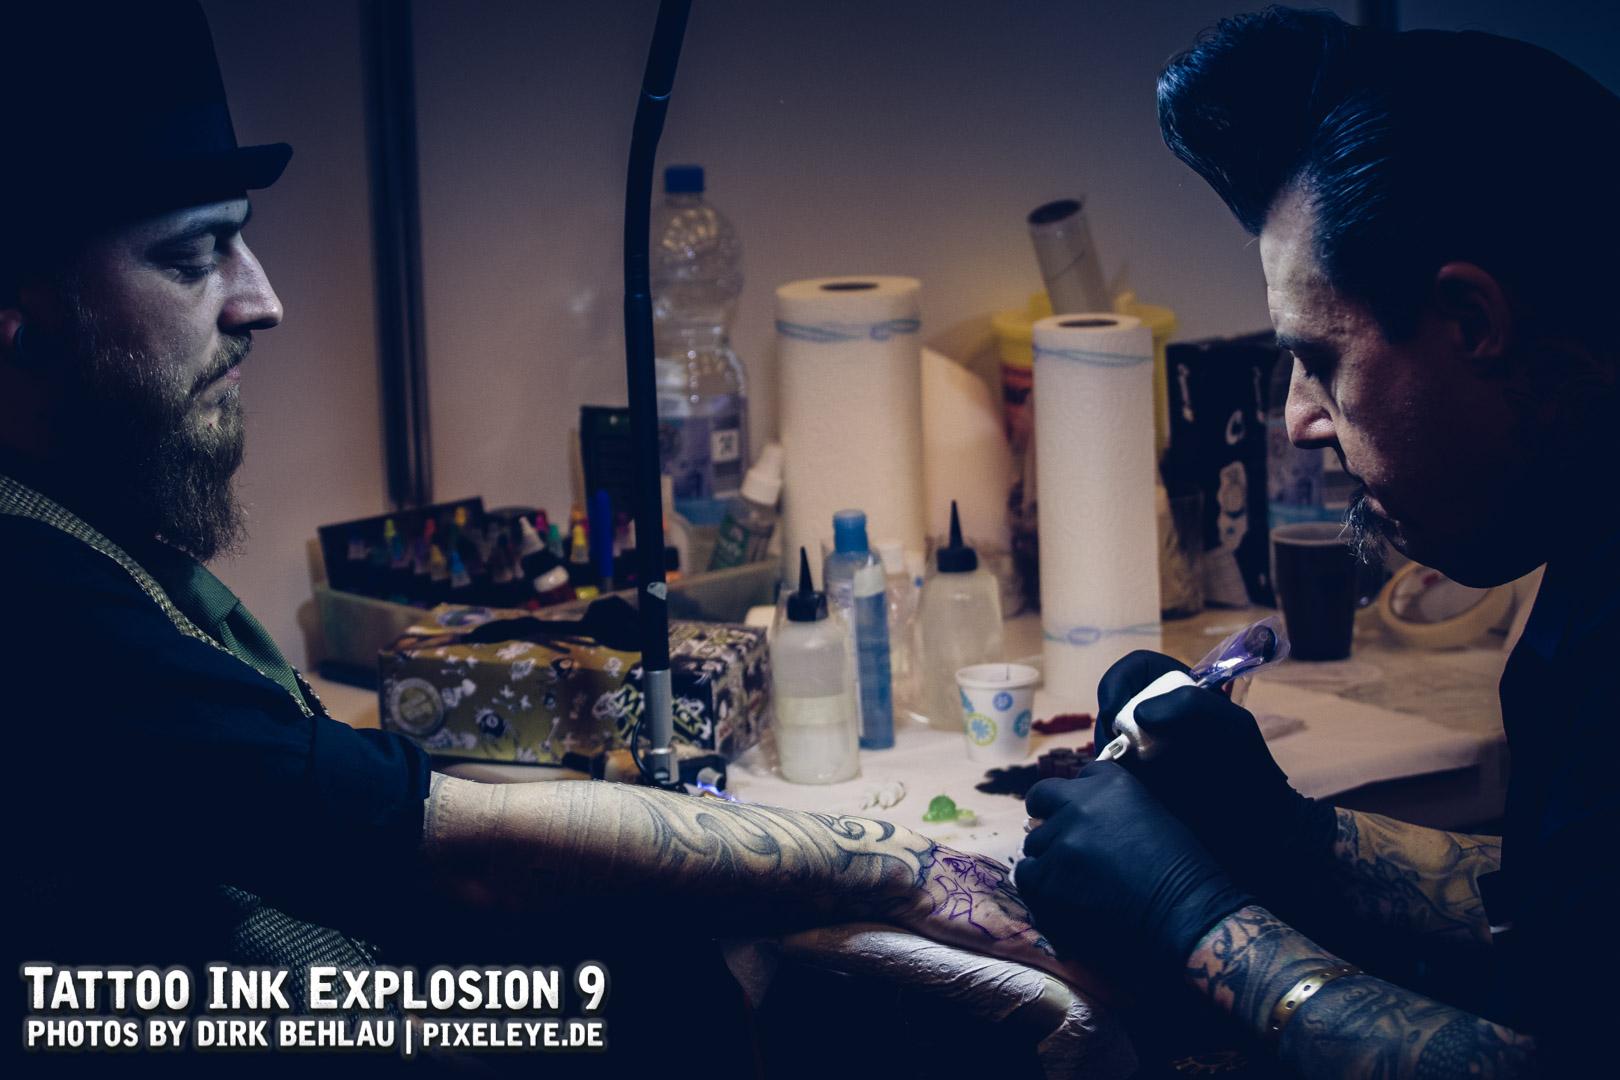 Tattoo Ink Explosion 2018 WEB by Dirk Behlau-1270.jpg